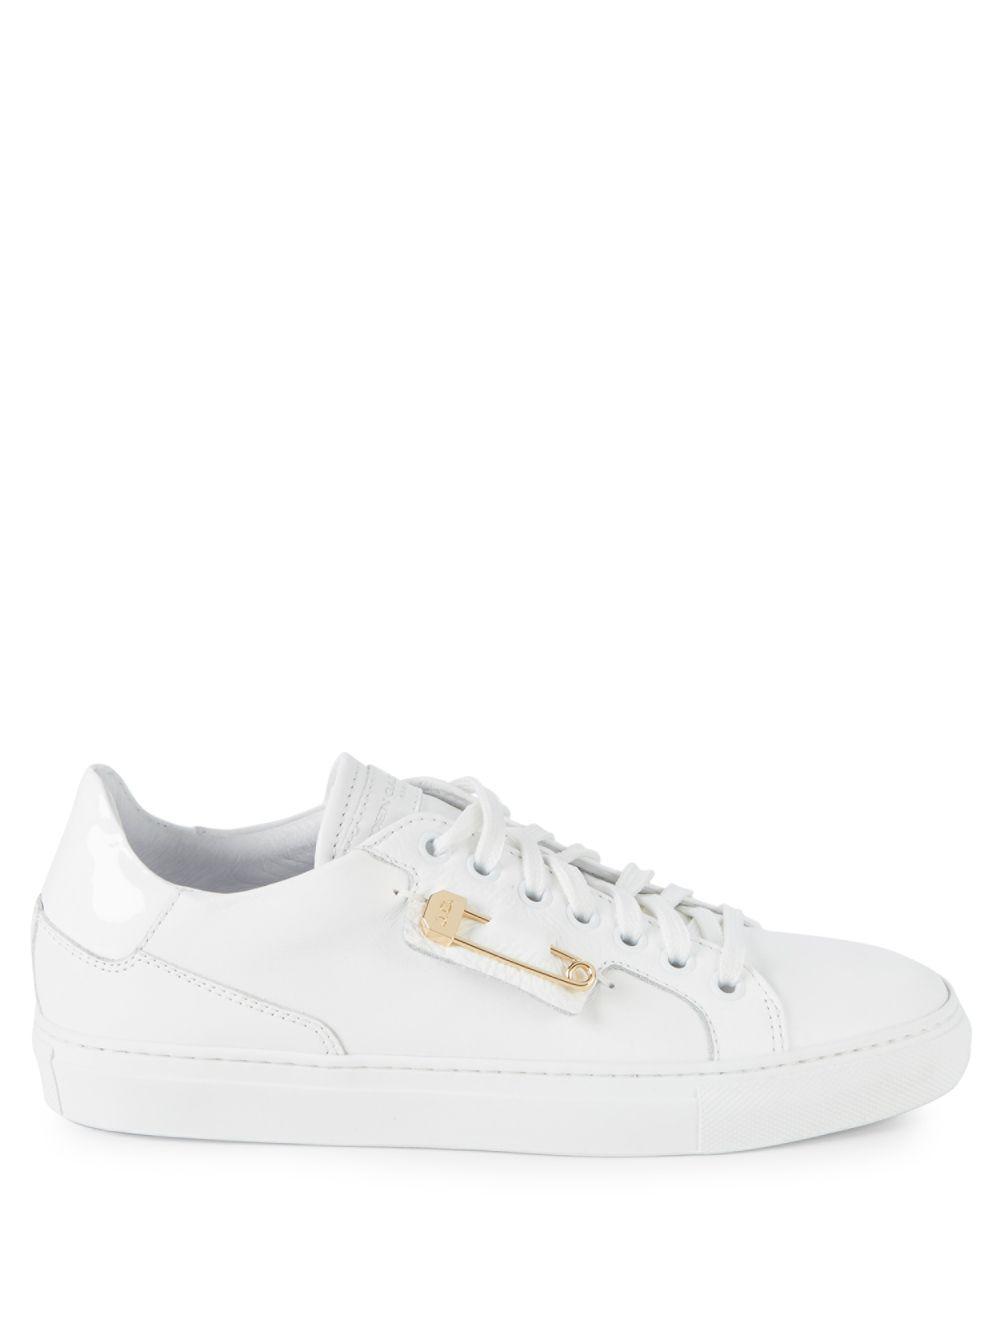 John Galliano Leather Sneakers in White